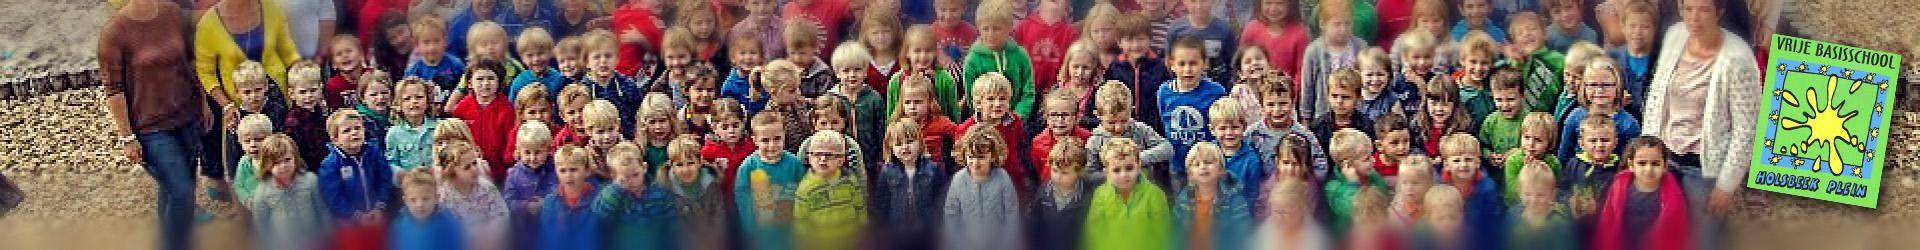 Vrije Basisschool Holsbeek Plein